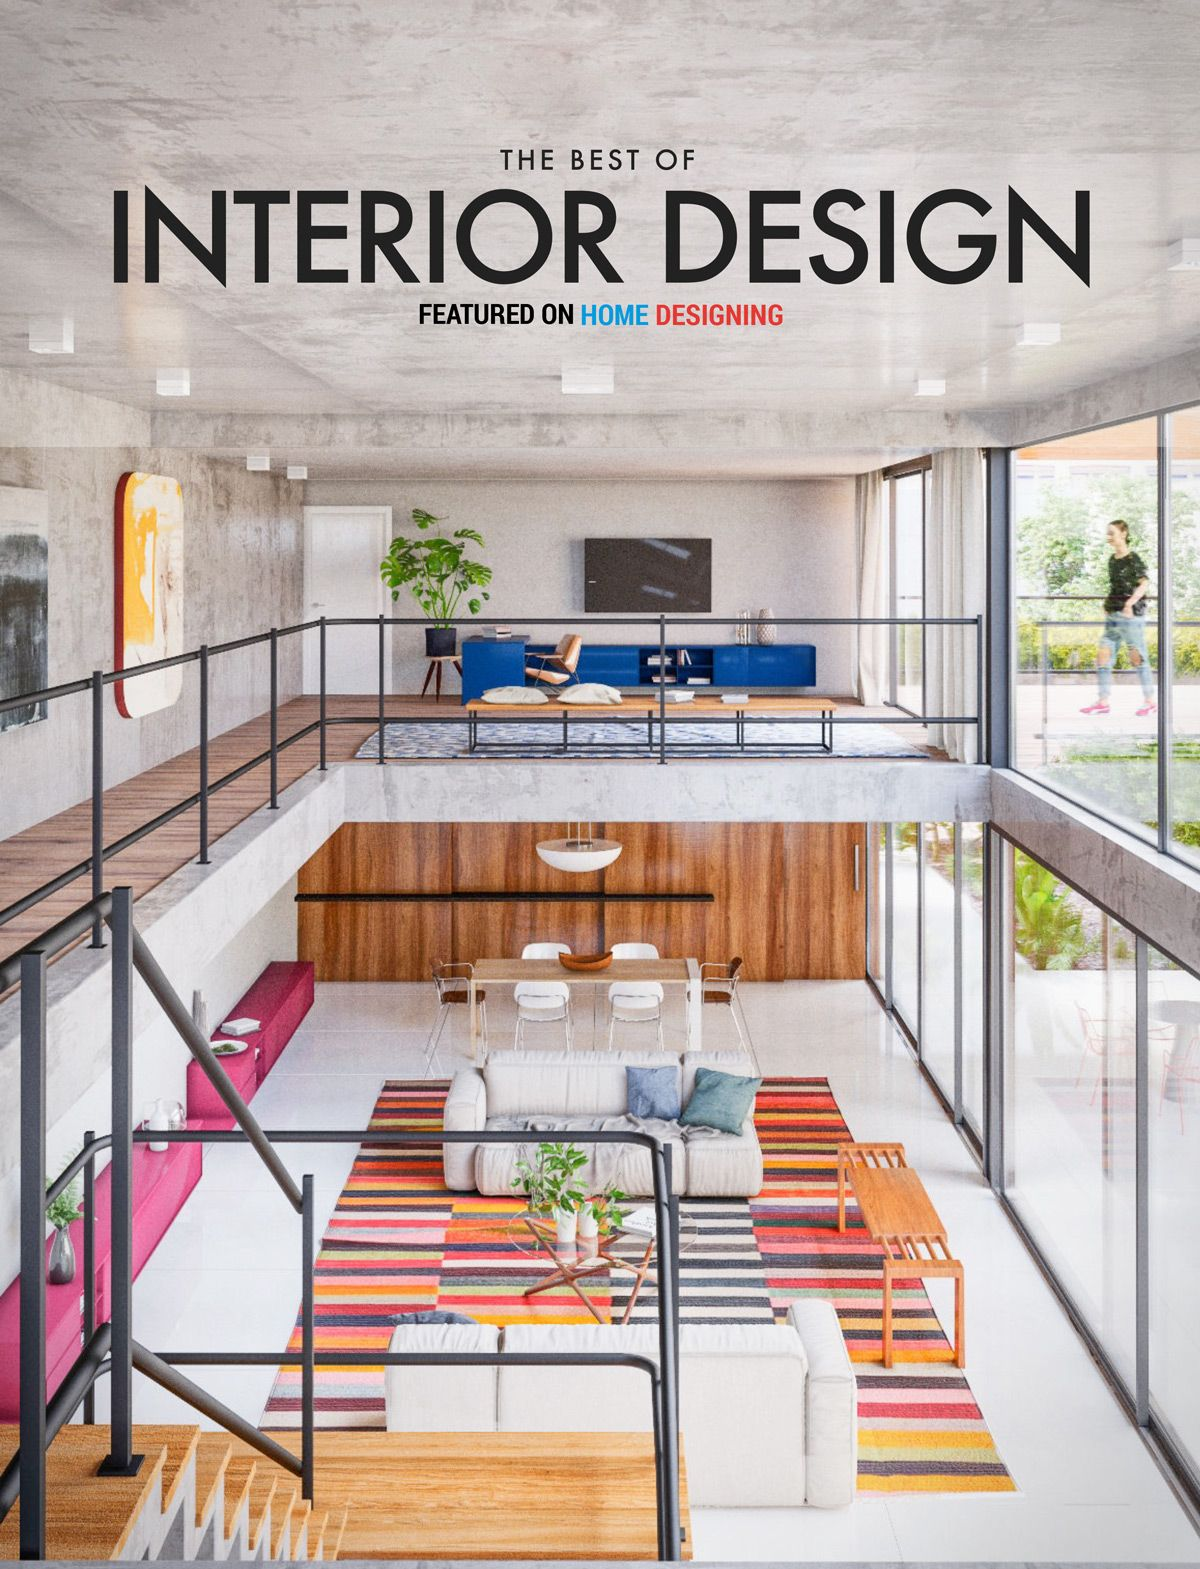 Free Interior Design Ebook The Best Of Interior Design Interior Design Ideas House Design Small Apartment Design House